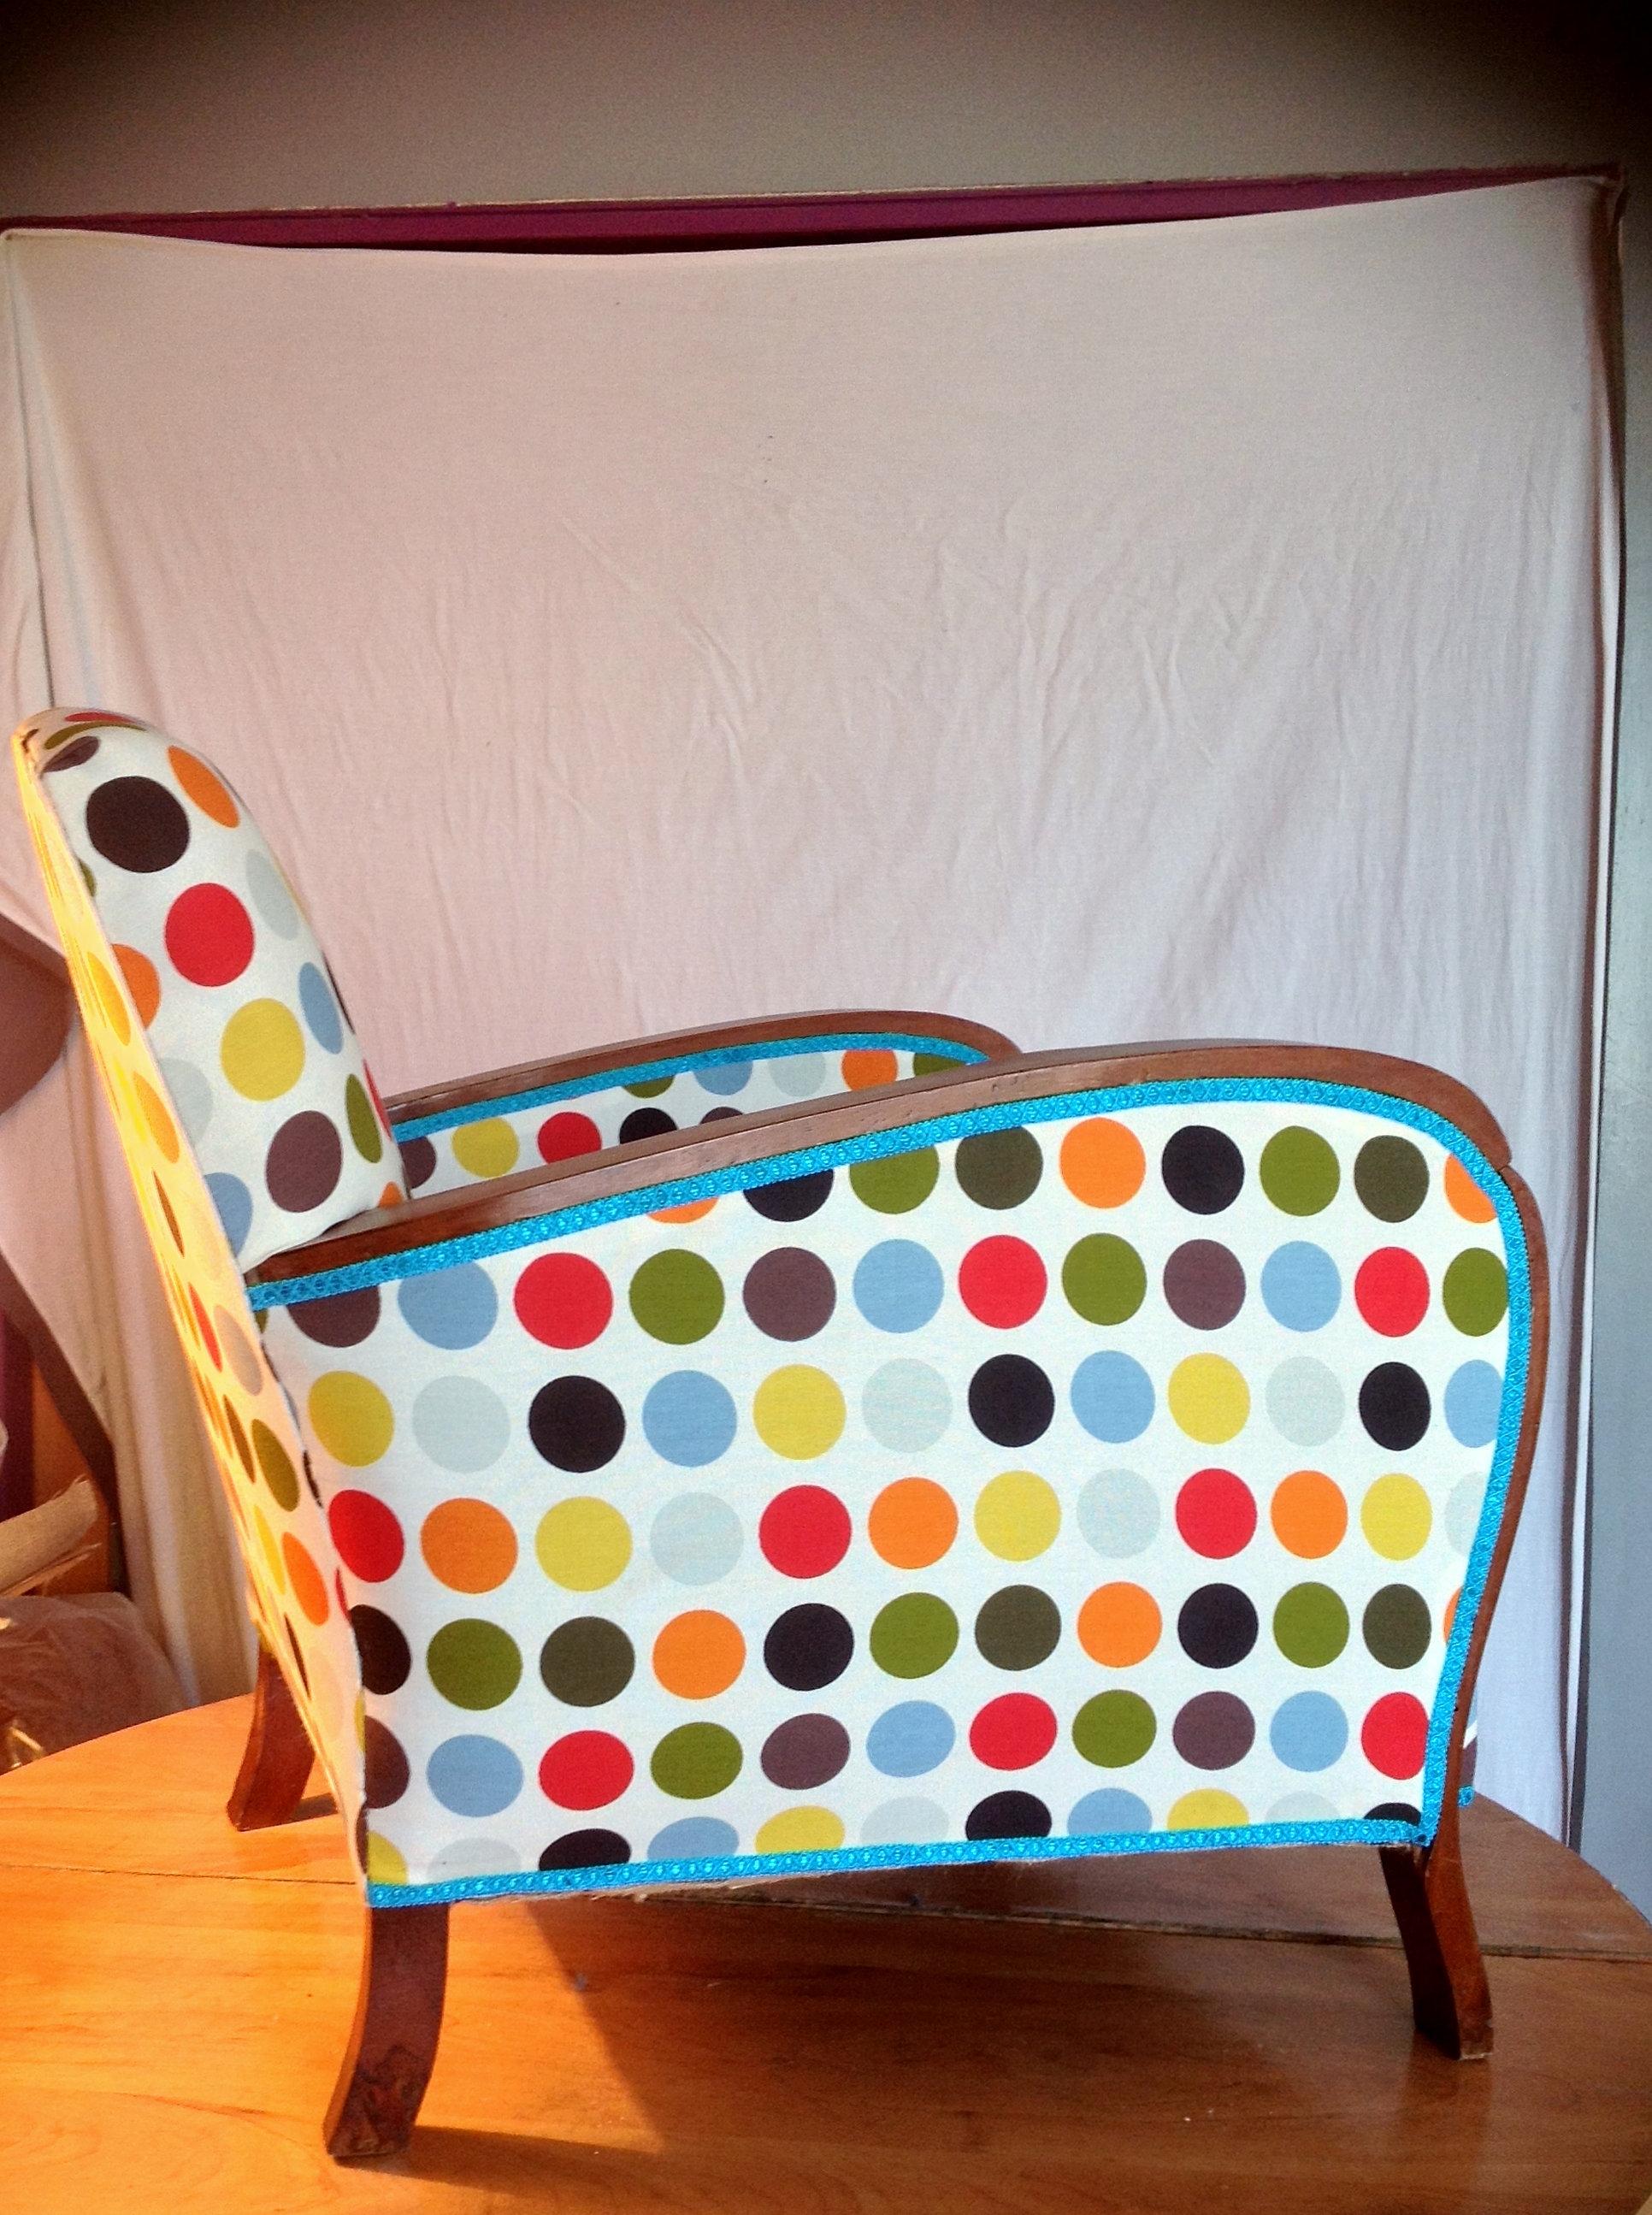 tapissier baillargues refection fauteuils castries tarifs. Black Bedroom Furniture Sets. Home Design Ideas